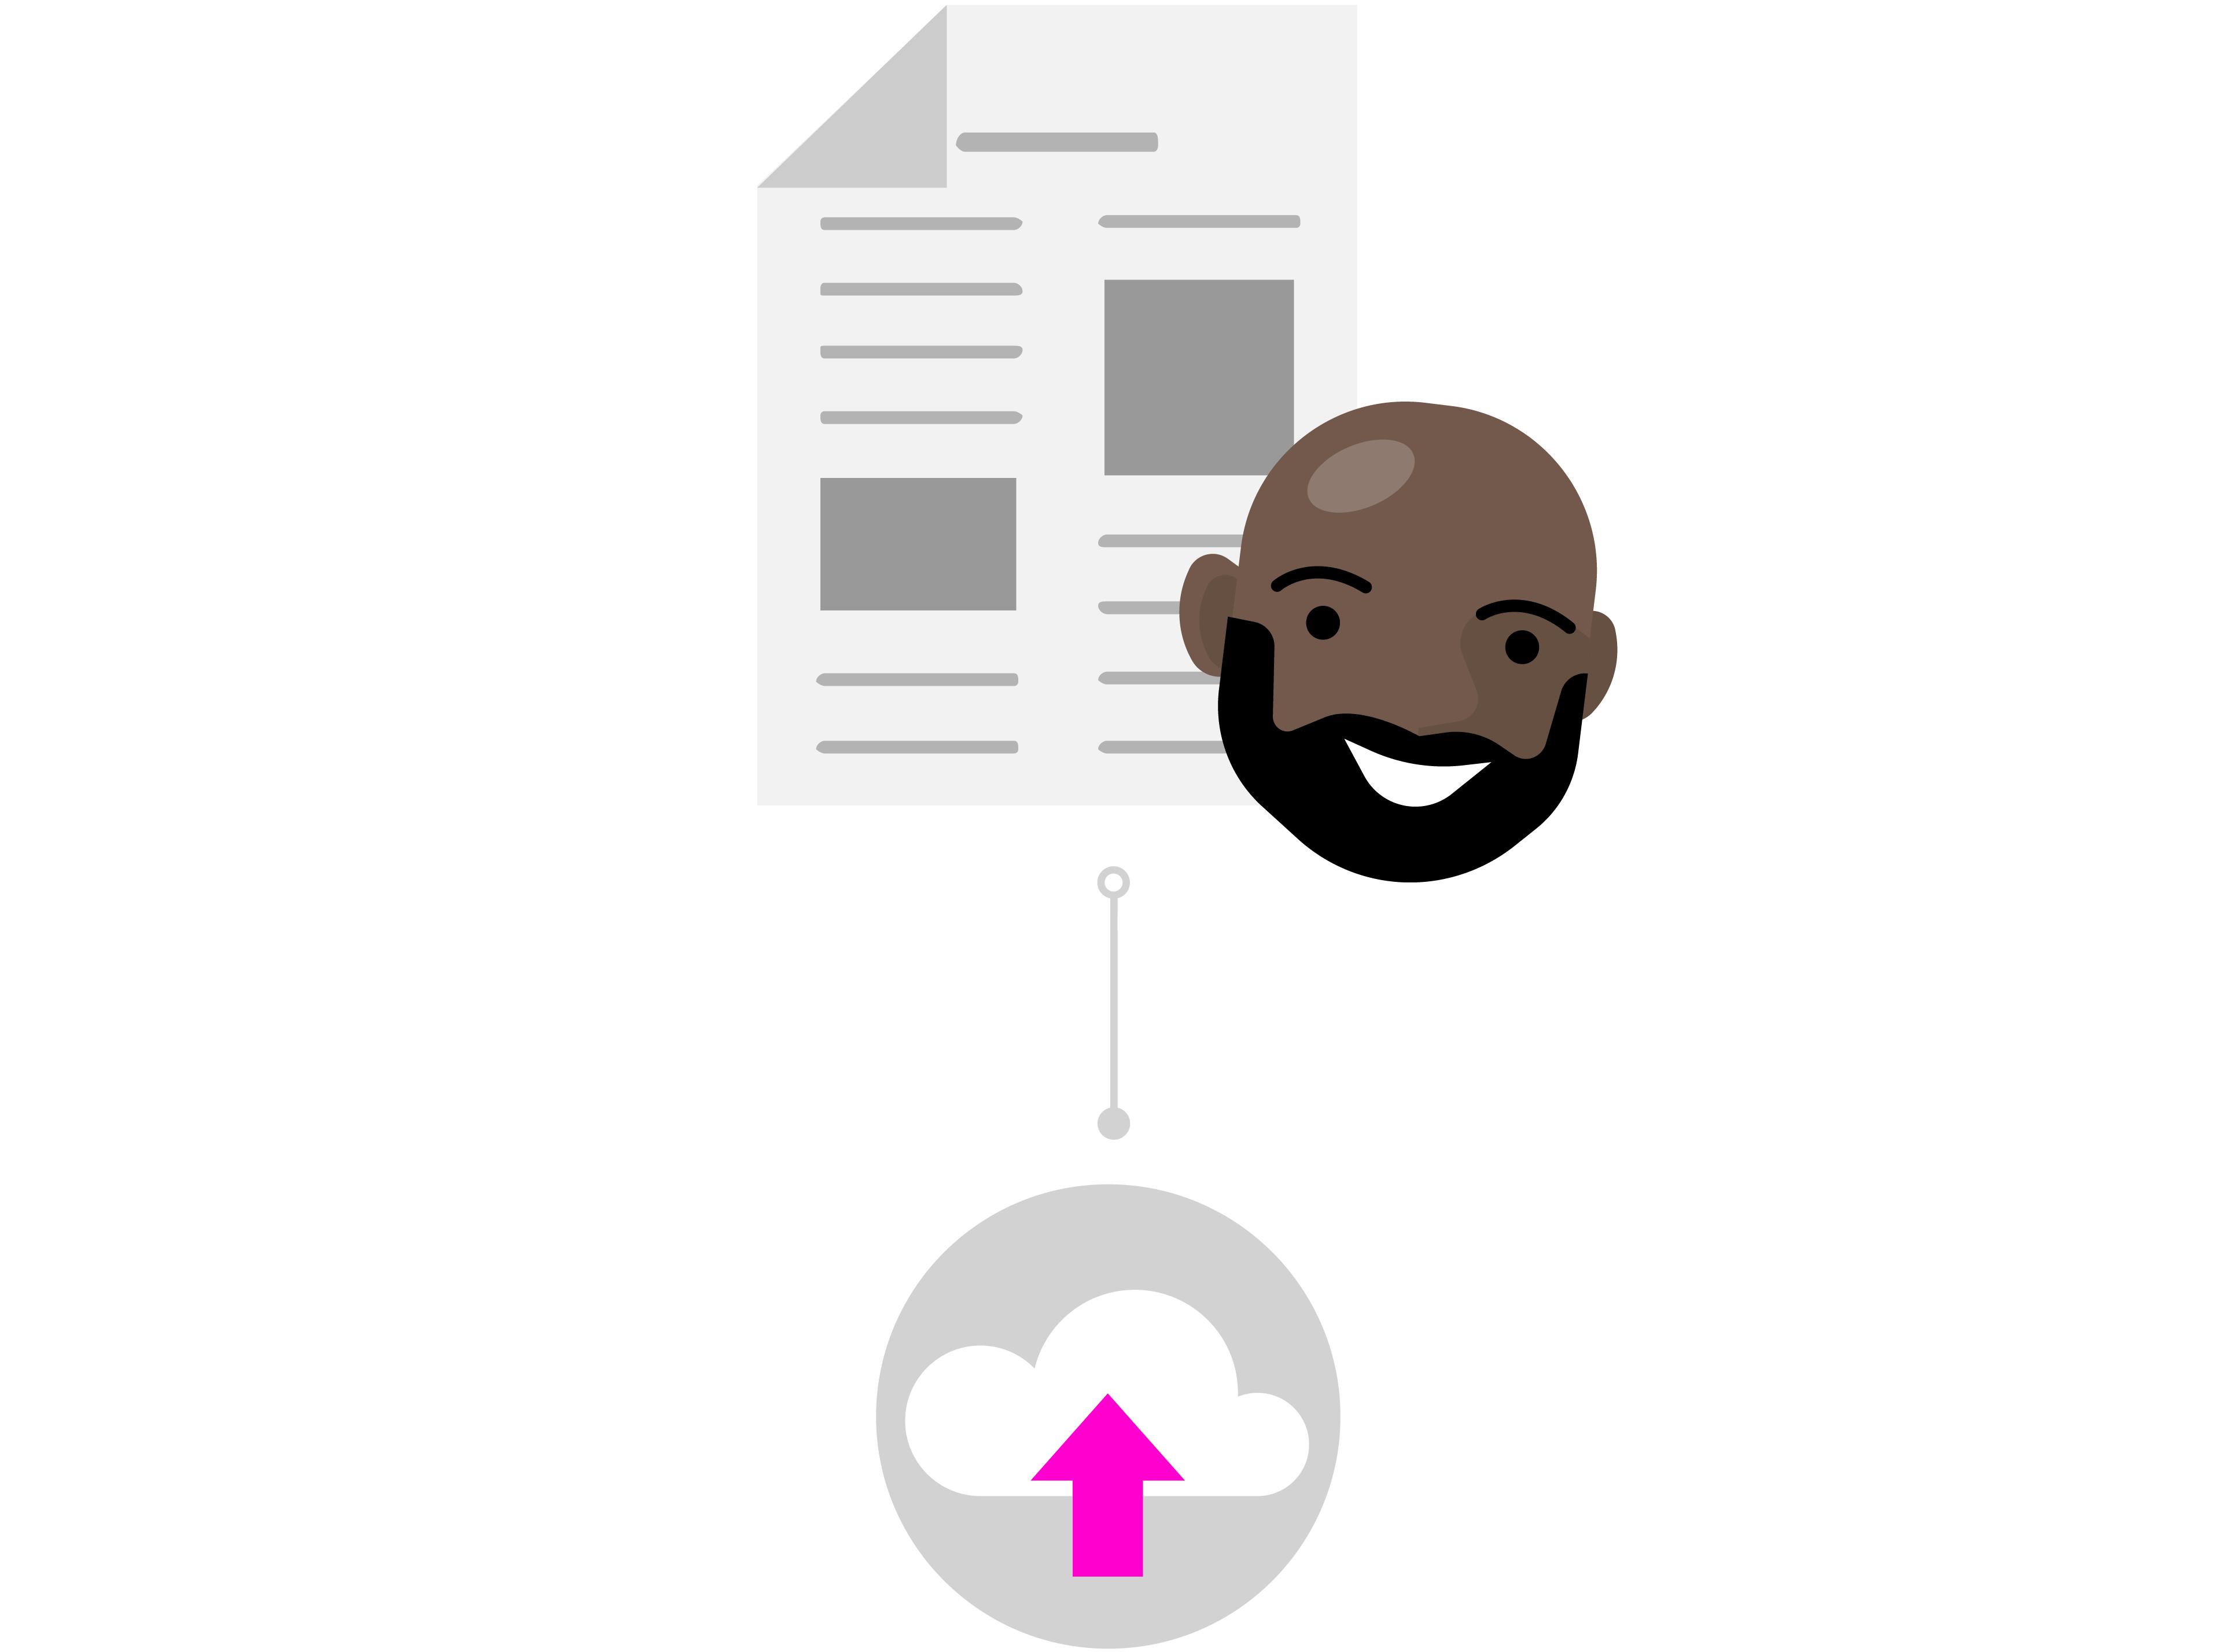 Koplietot privāti ar OneDrive